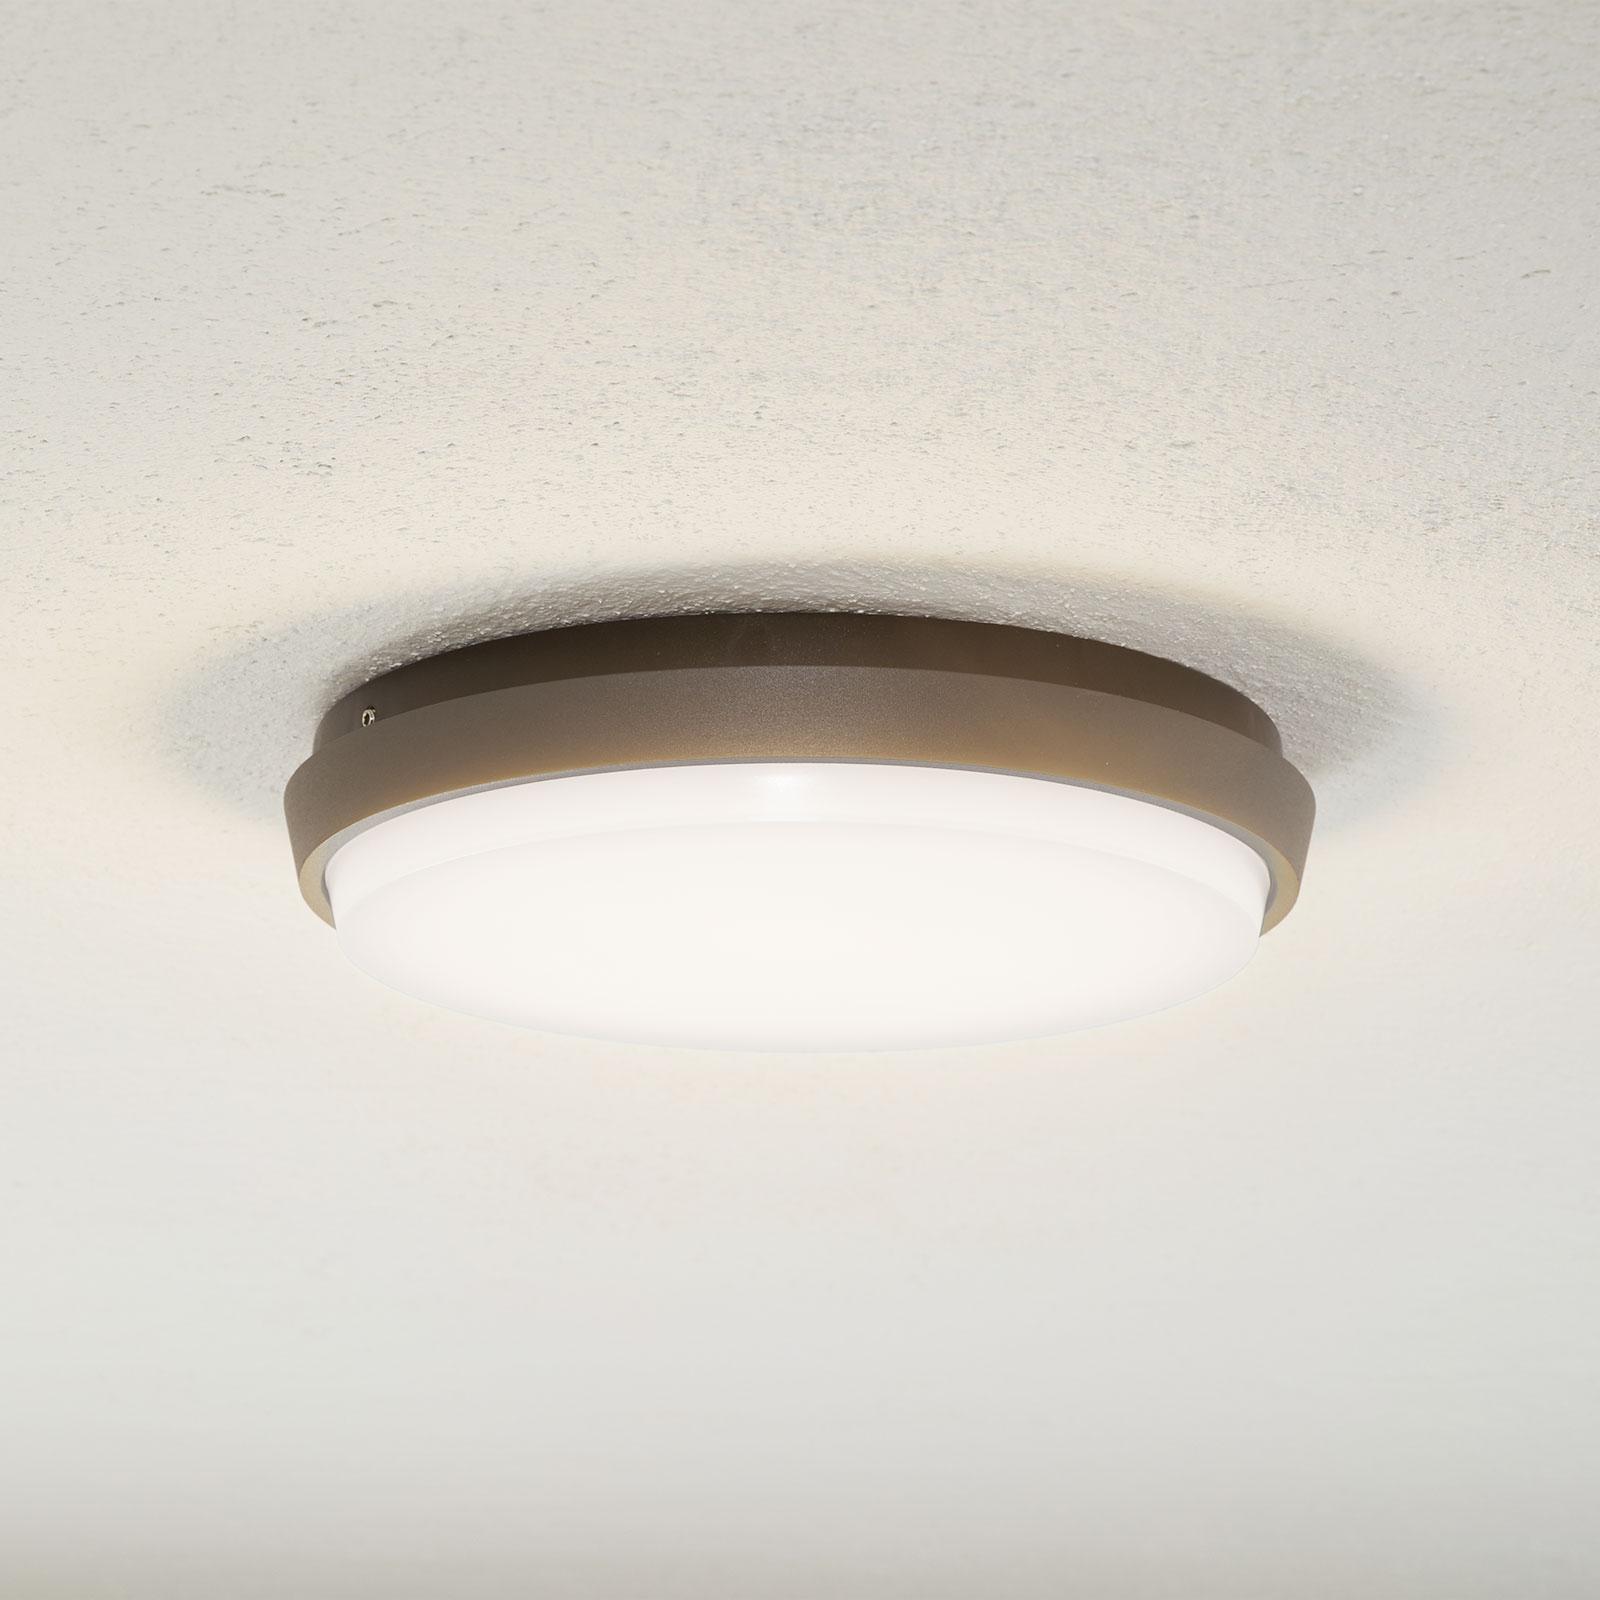 Lucande Amra LED outdoor ceiling light round 24 cm_9969066_1